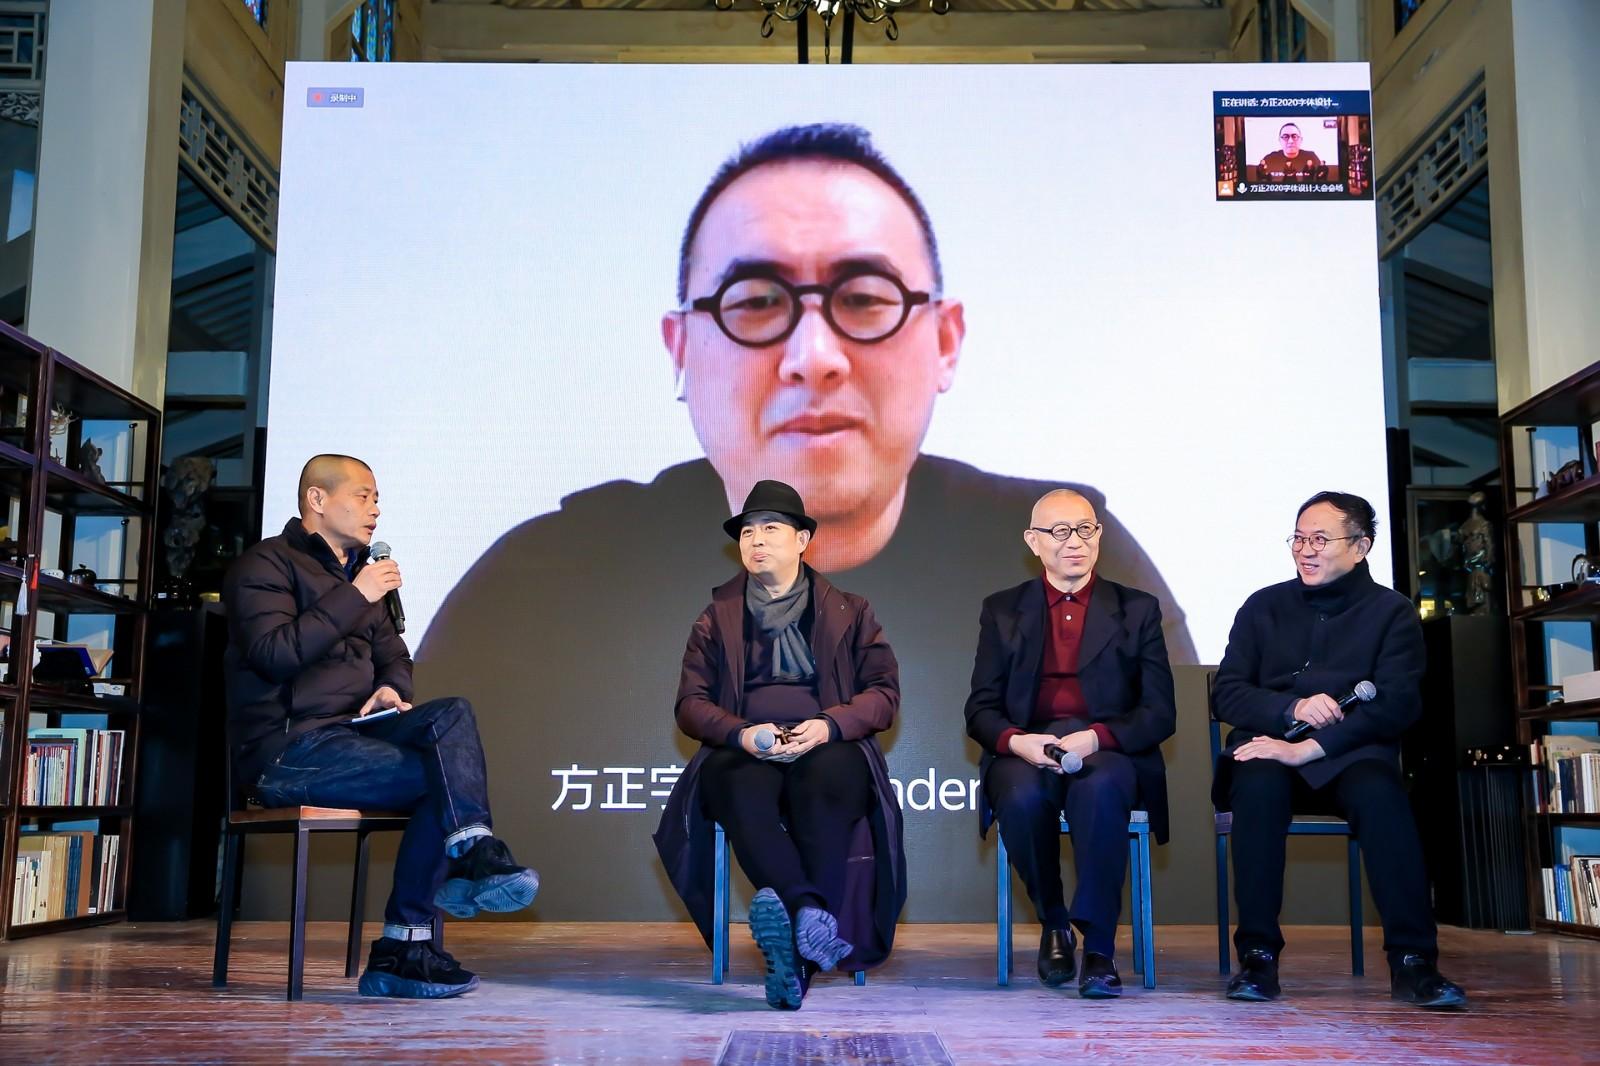 https://ft-bk1.oss-cn-zhangjiakou.aliyuncs.com/Public/Uploads/img/n_content_20201210180339_3690.jpg